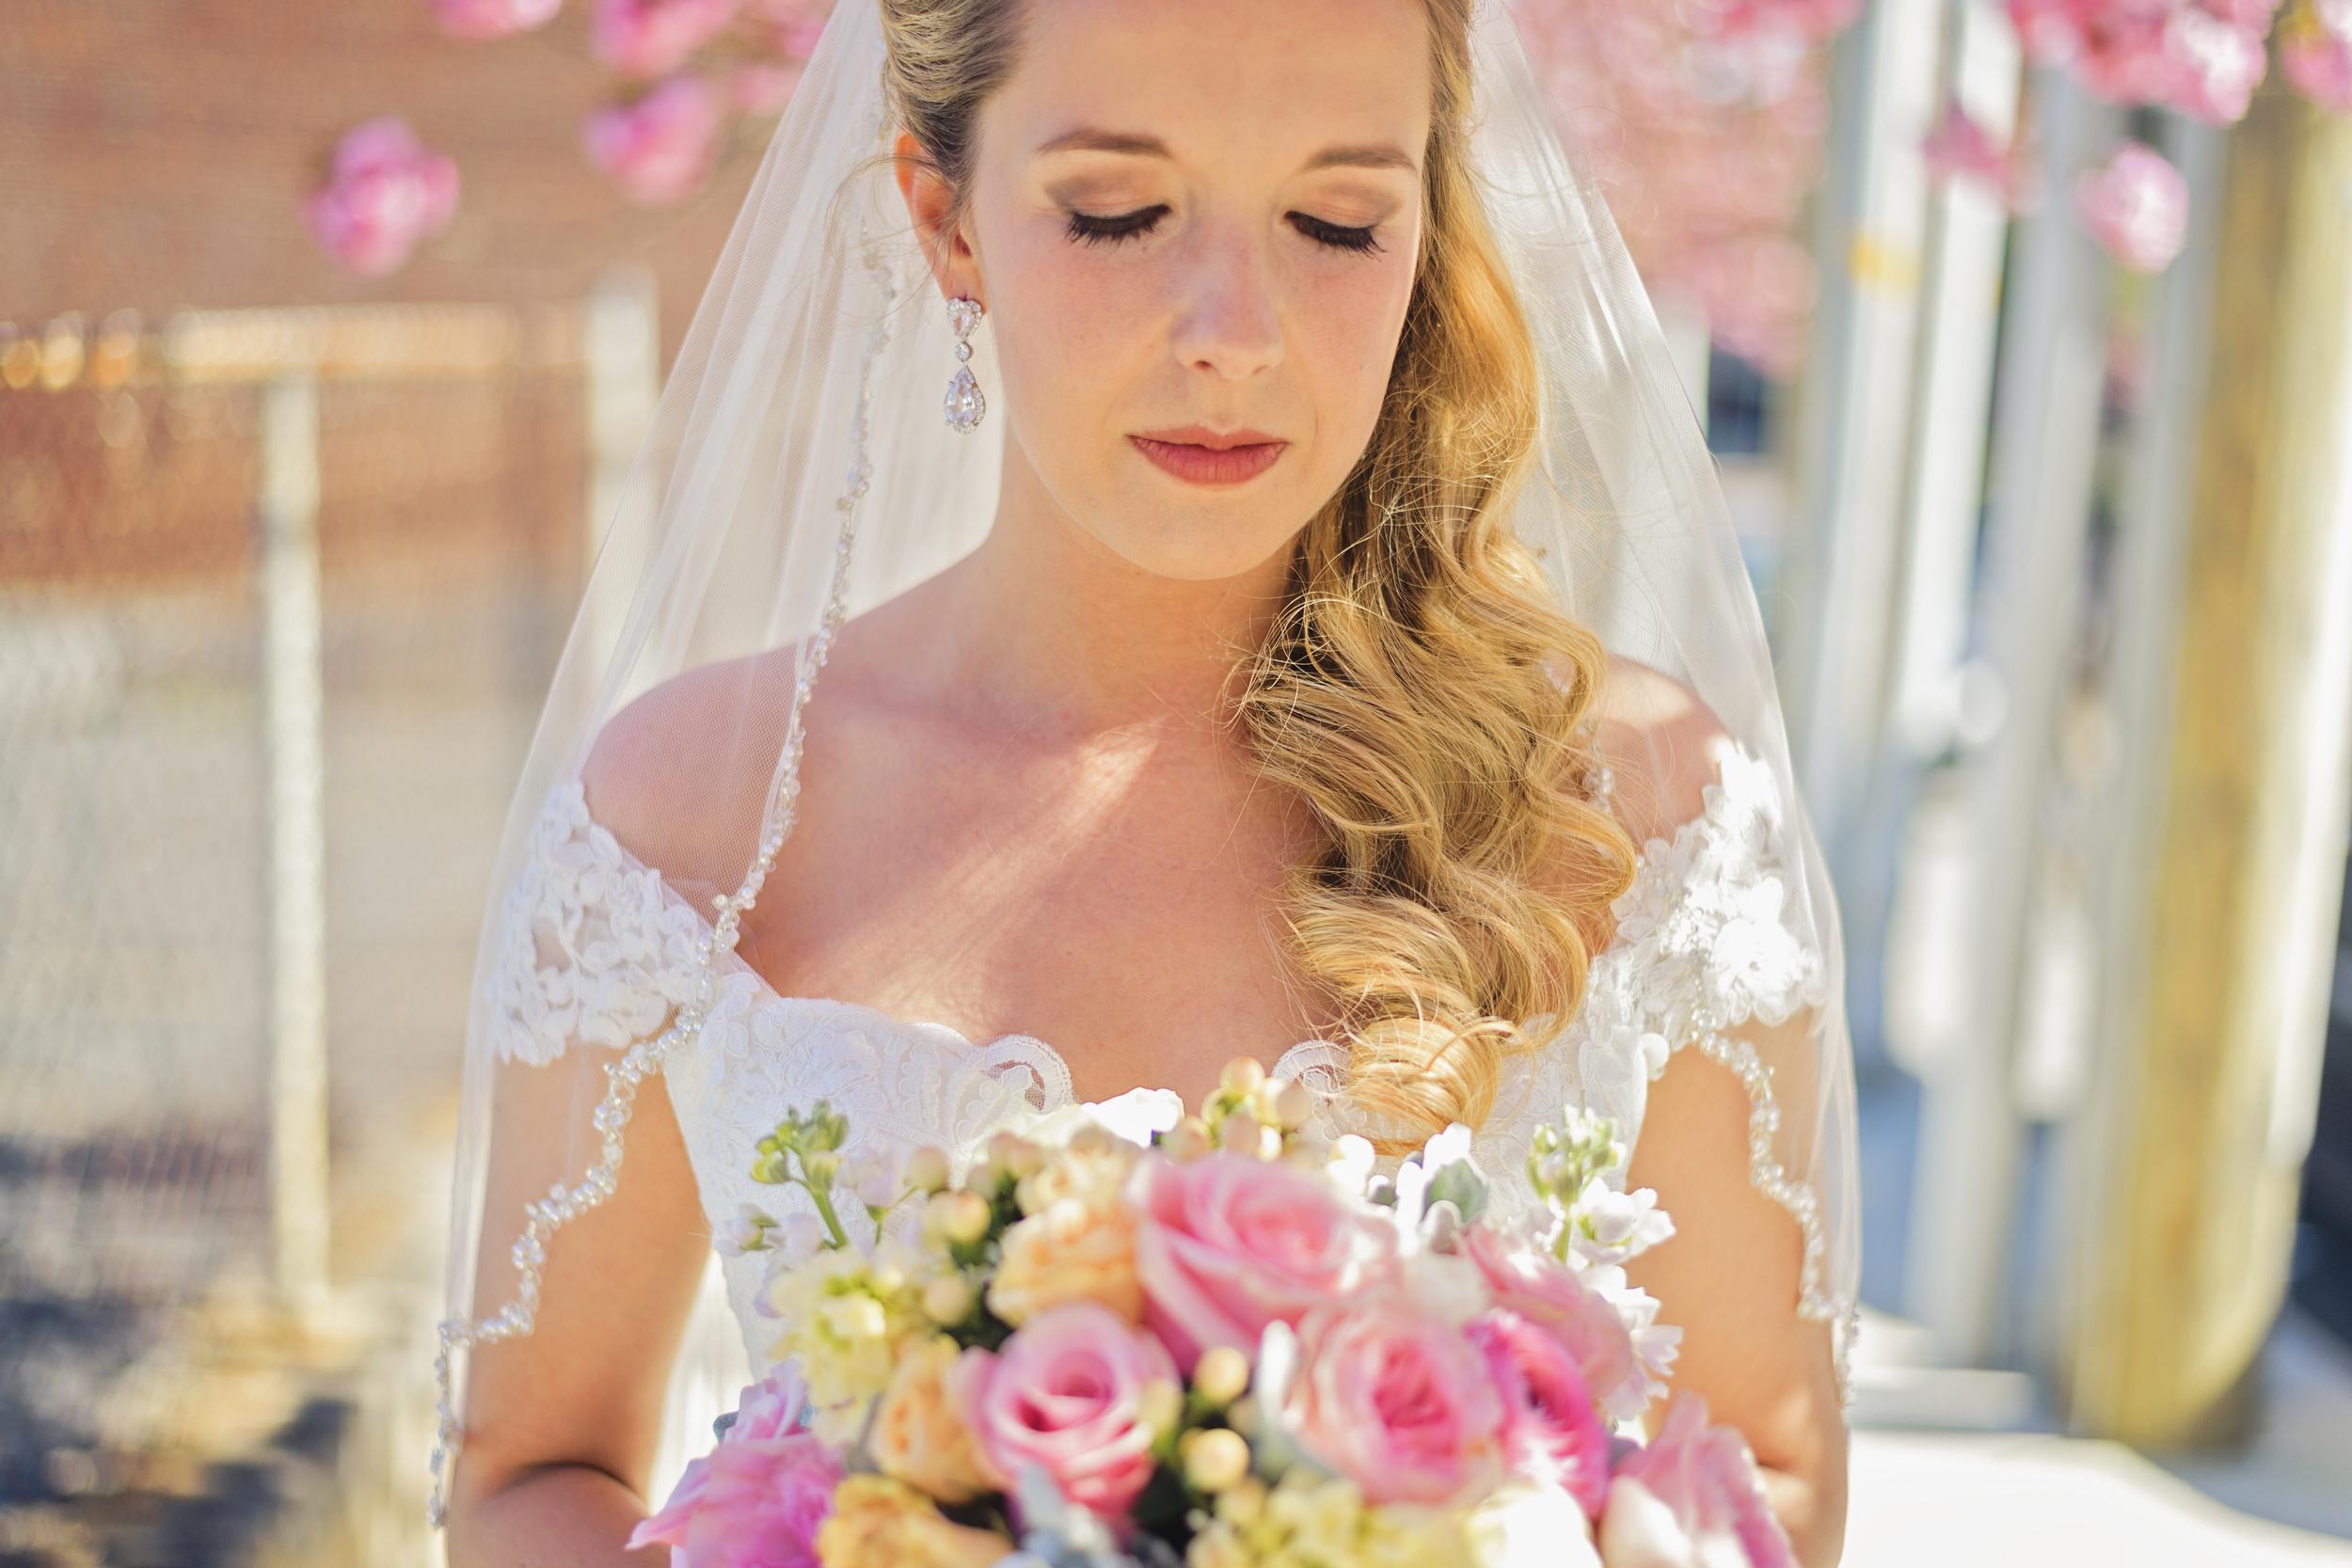 tresca_elegant_downtown_wedding_lynchburg_va018.jpg